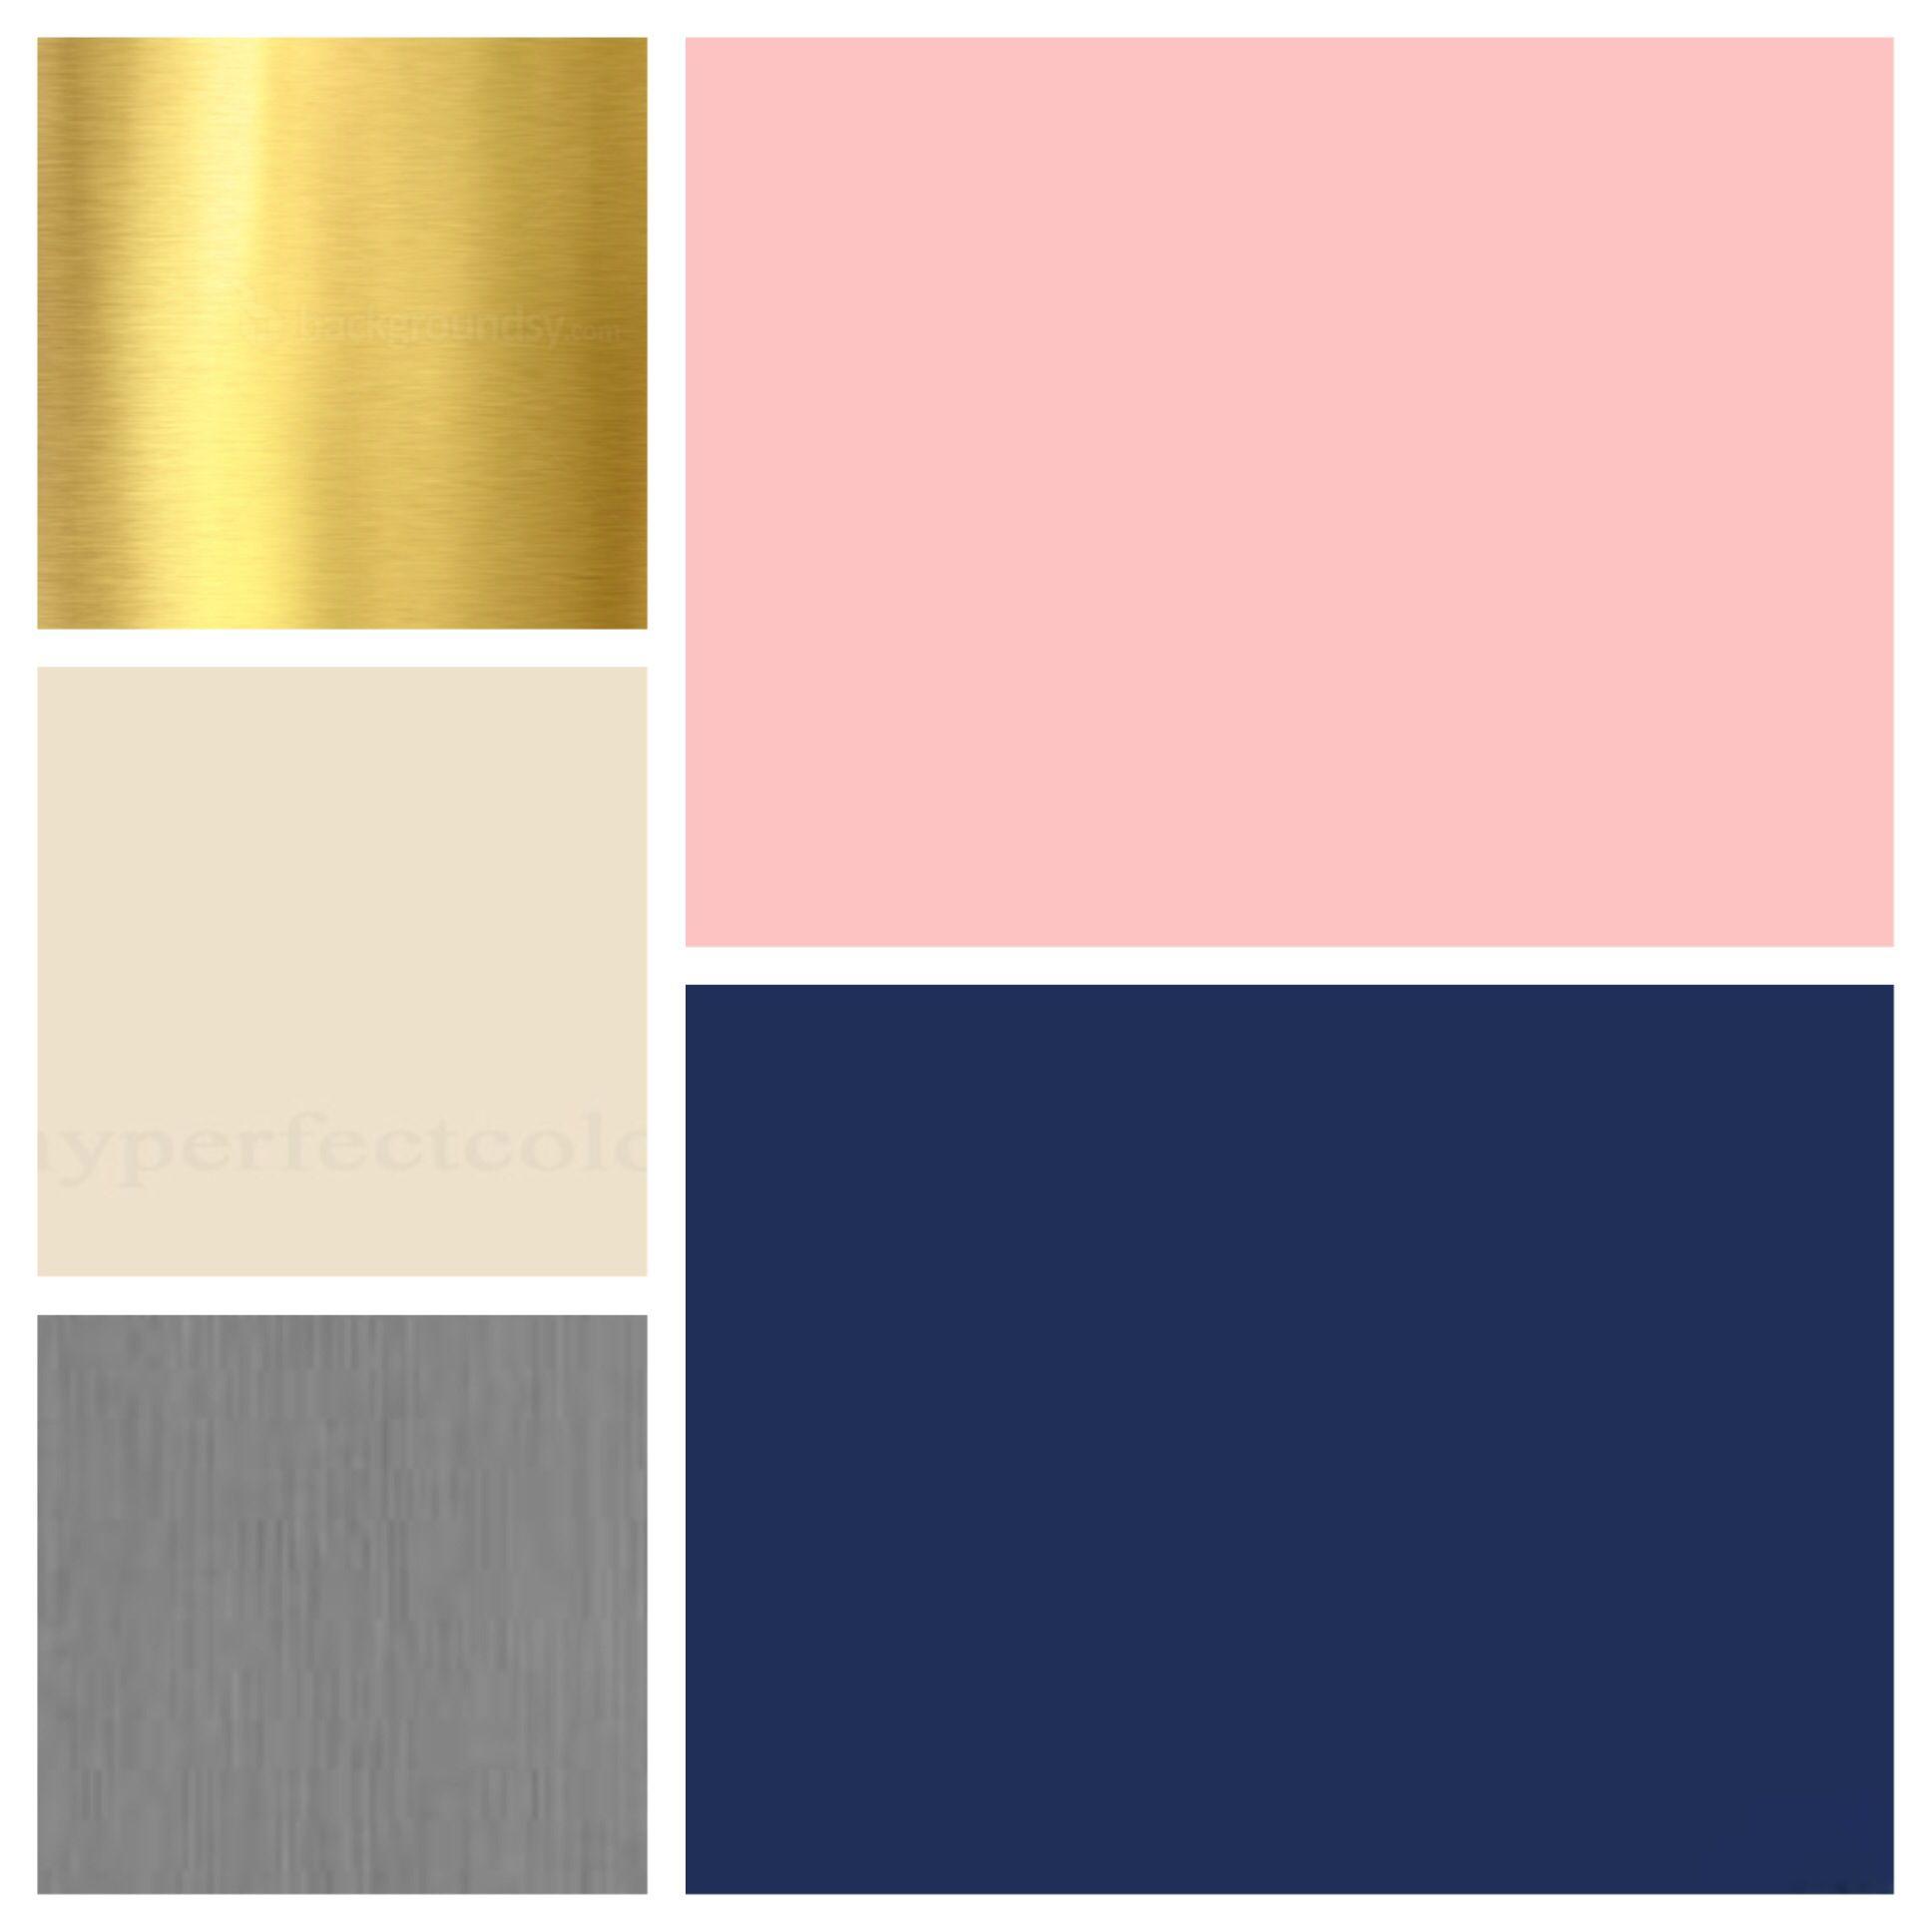 wedding colors blush navy ivory gold grey wedding. Black Bedroom Furniture Sets. Home Design Ideas